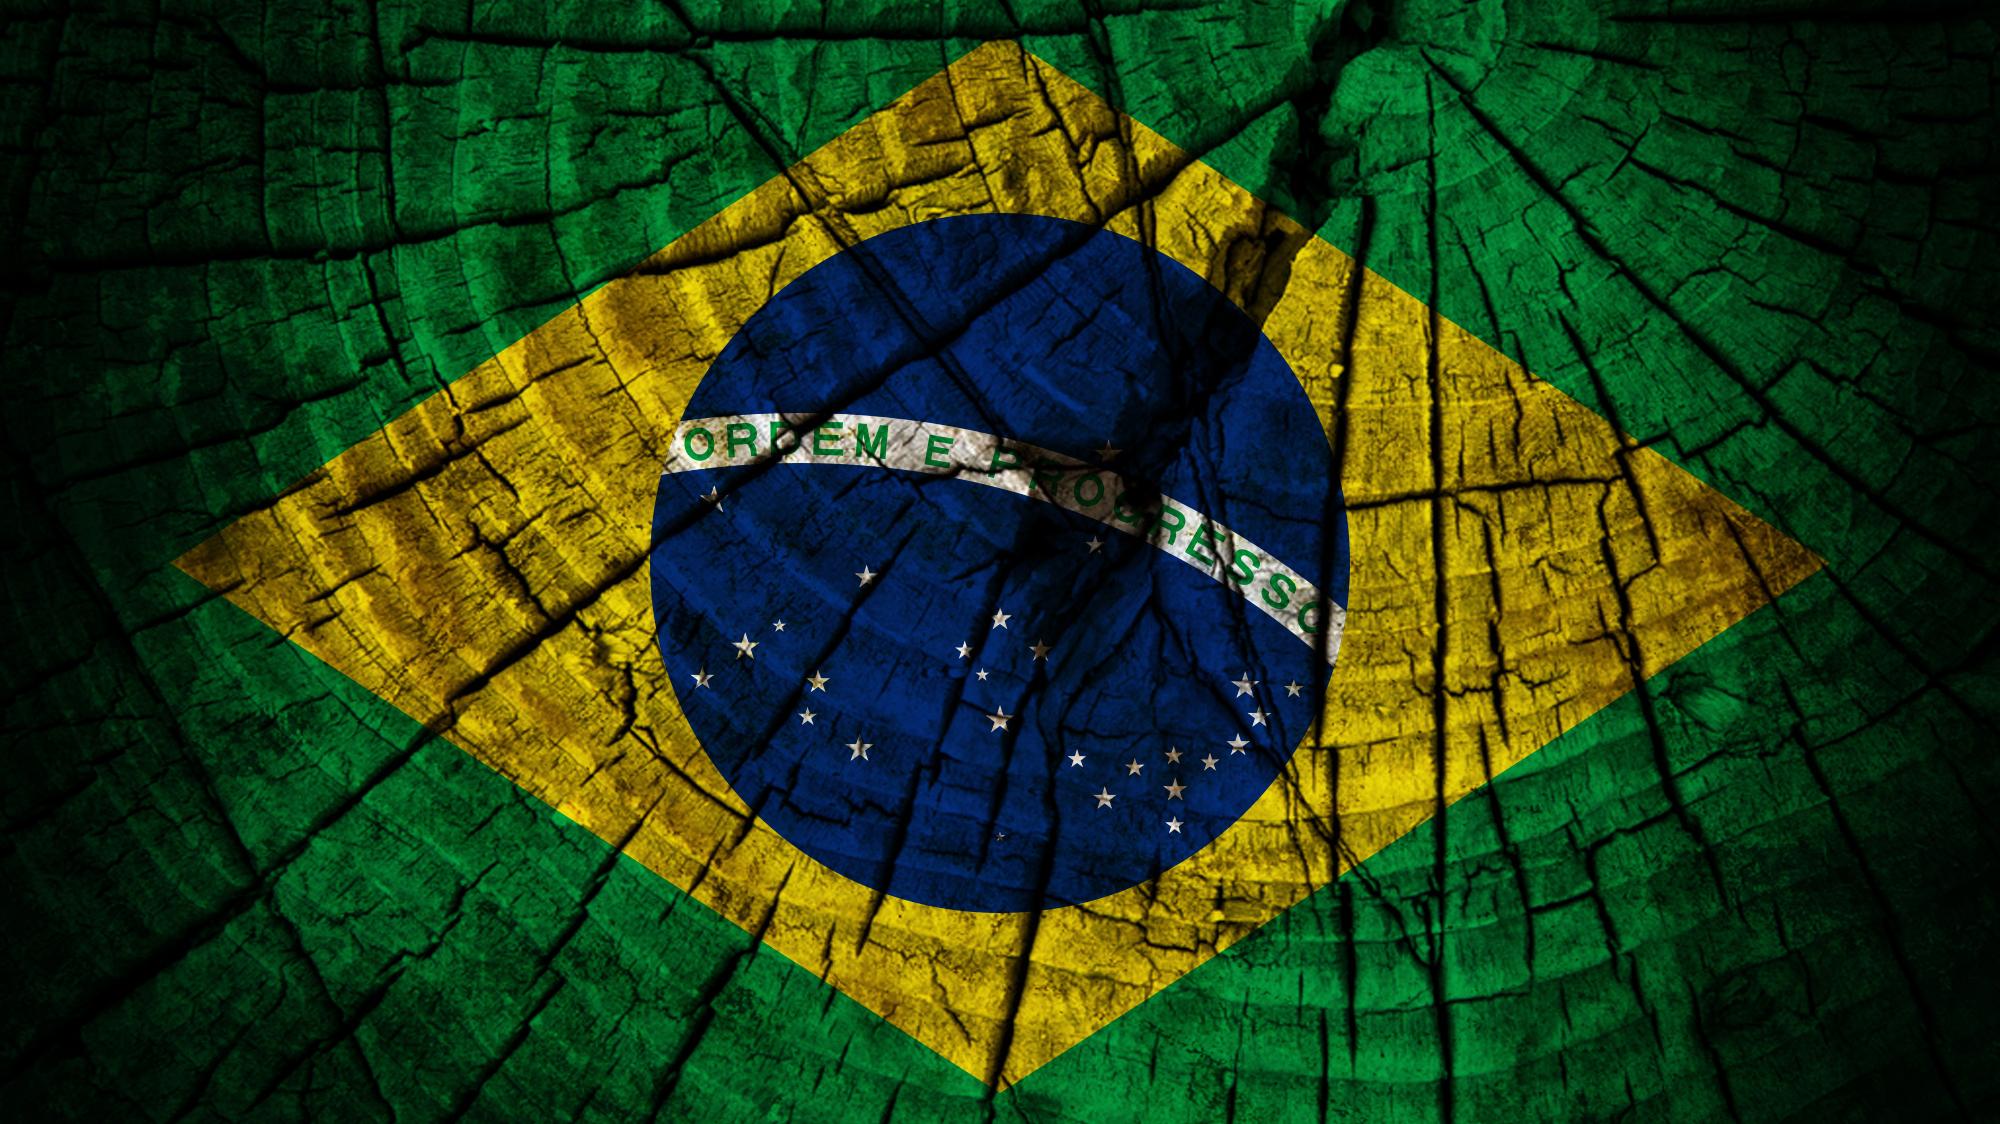 football national teams brazil wallpapers 1109 4 wallpaper id 2200 2000x1124